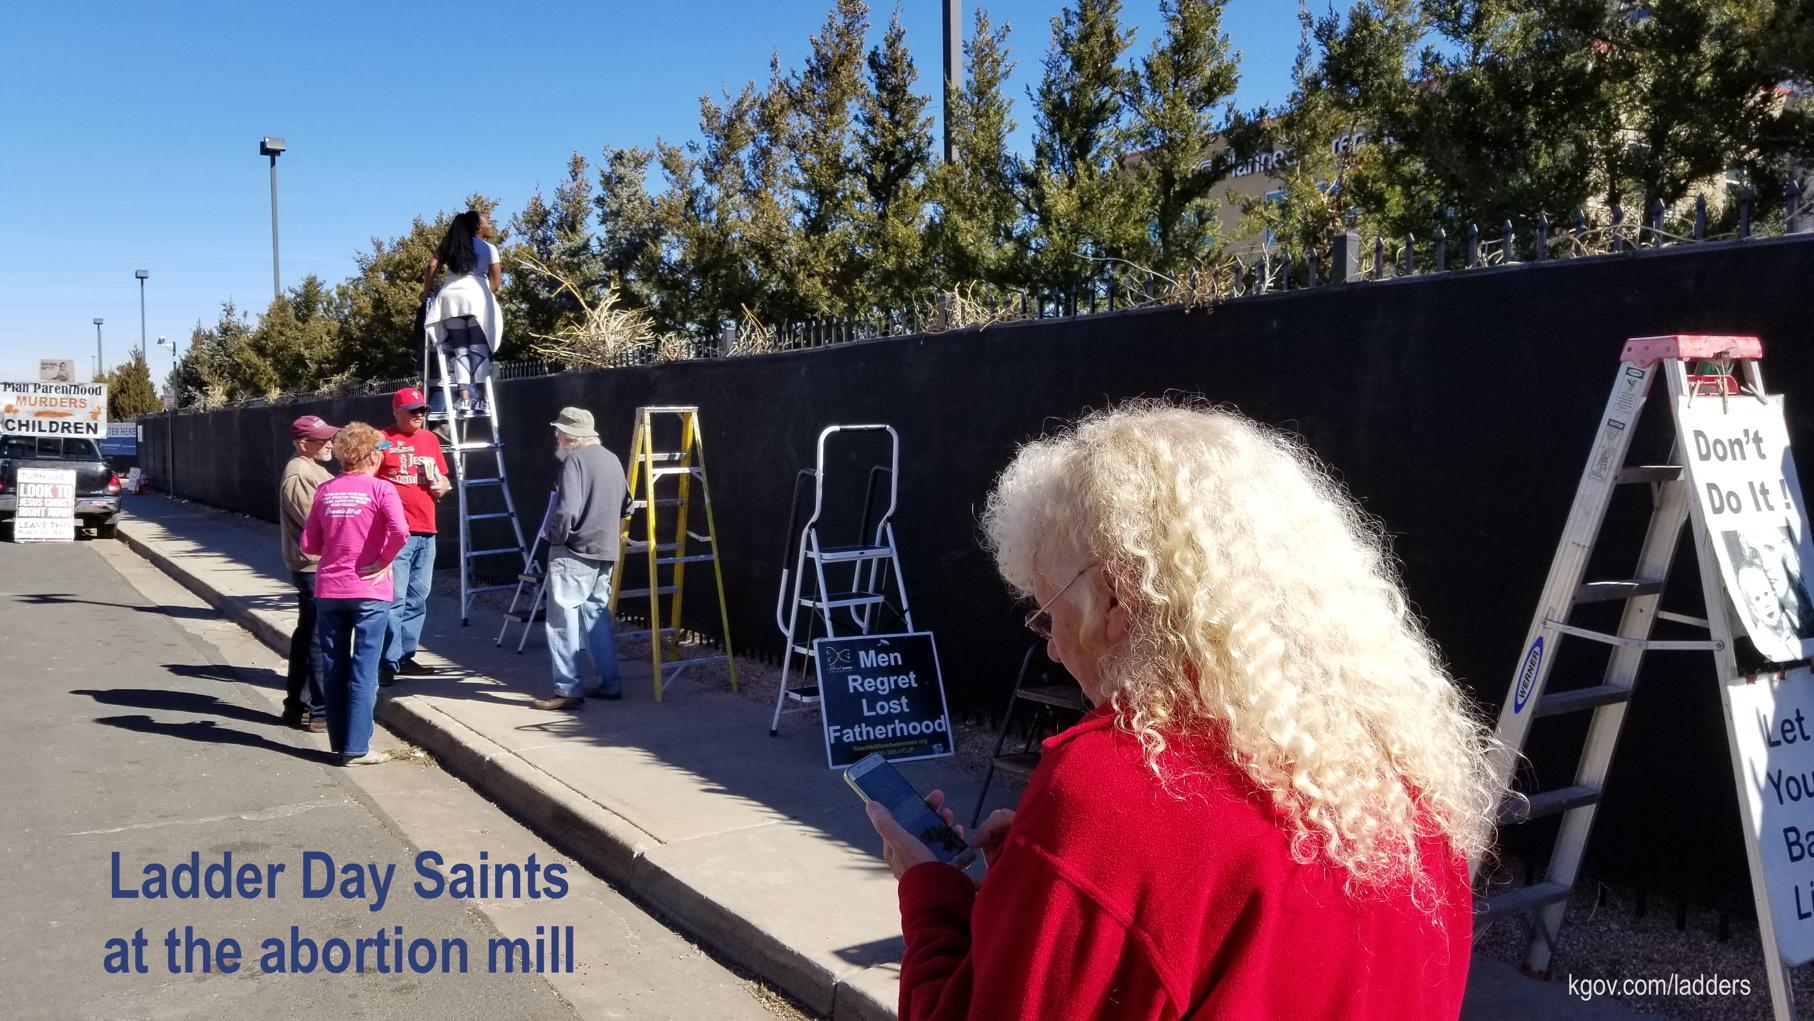 The day after Denver police charged abolitionist Ken Scott with ladder-blocking Planned Parenthood's sidewalk